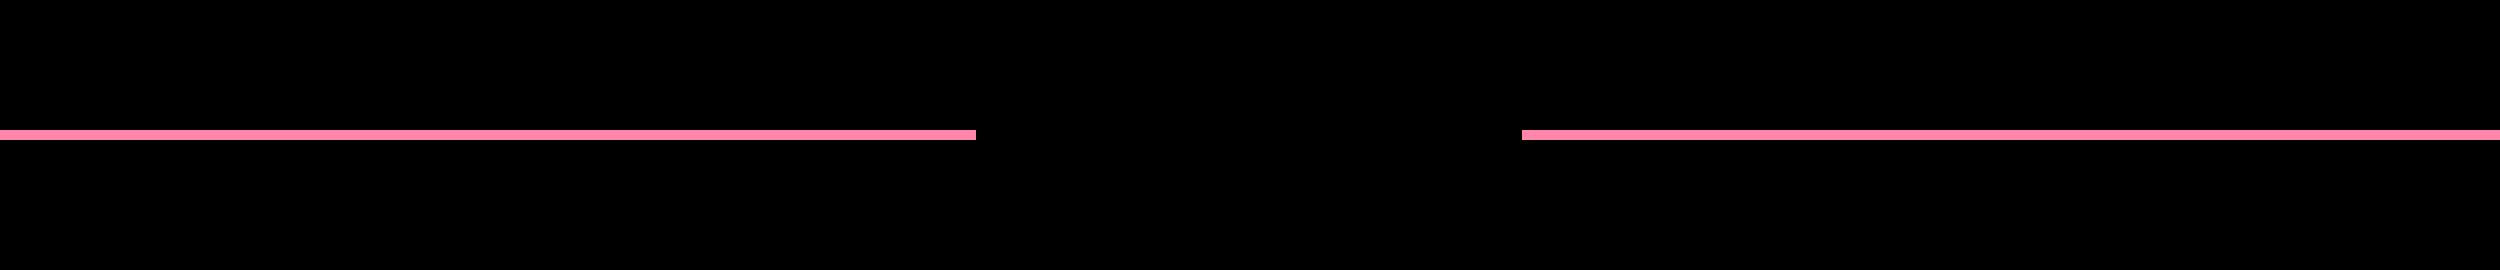 Fiffy-hdr-textline-menu.png